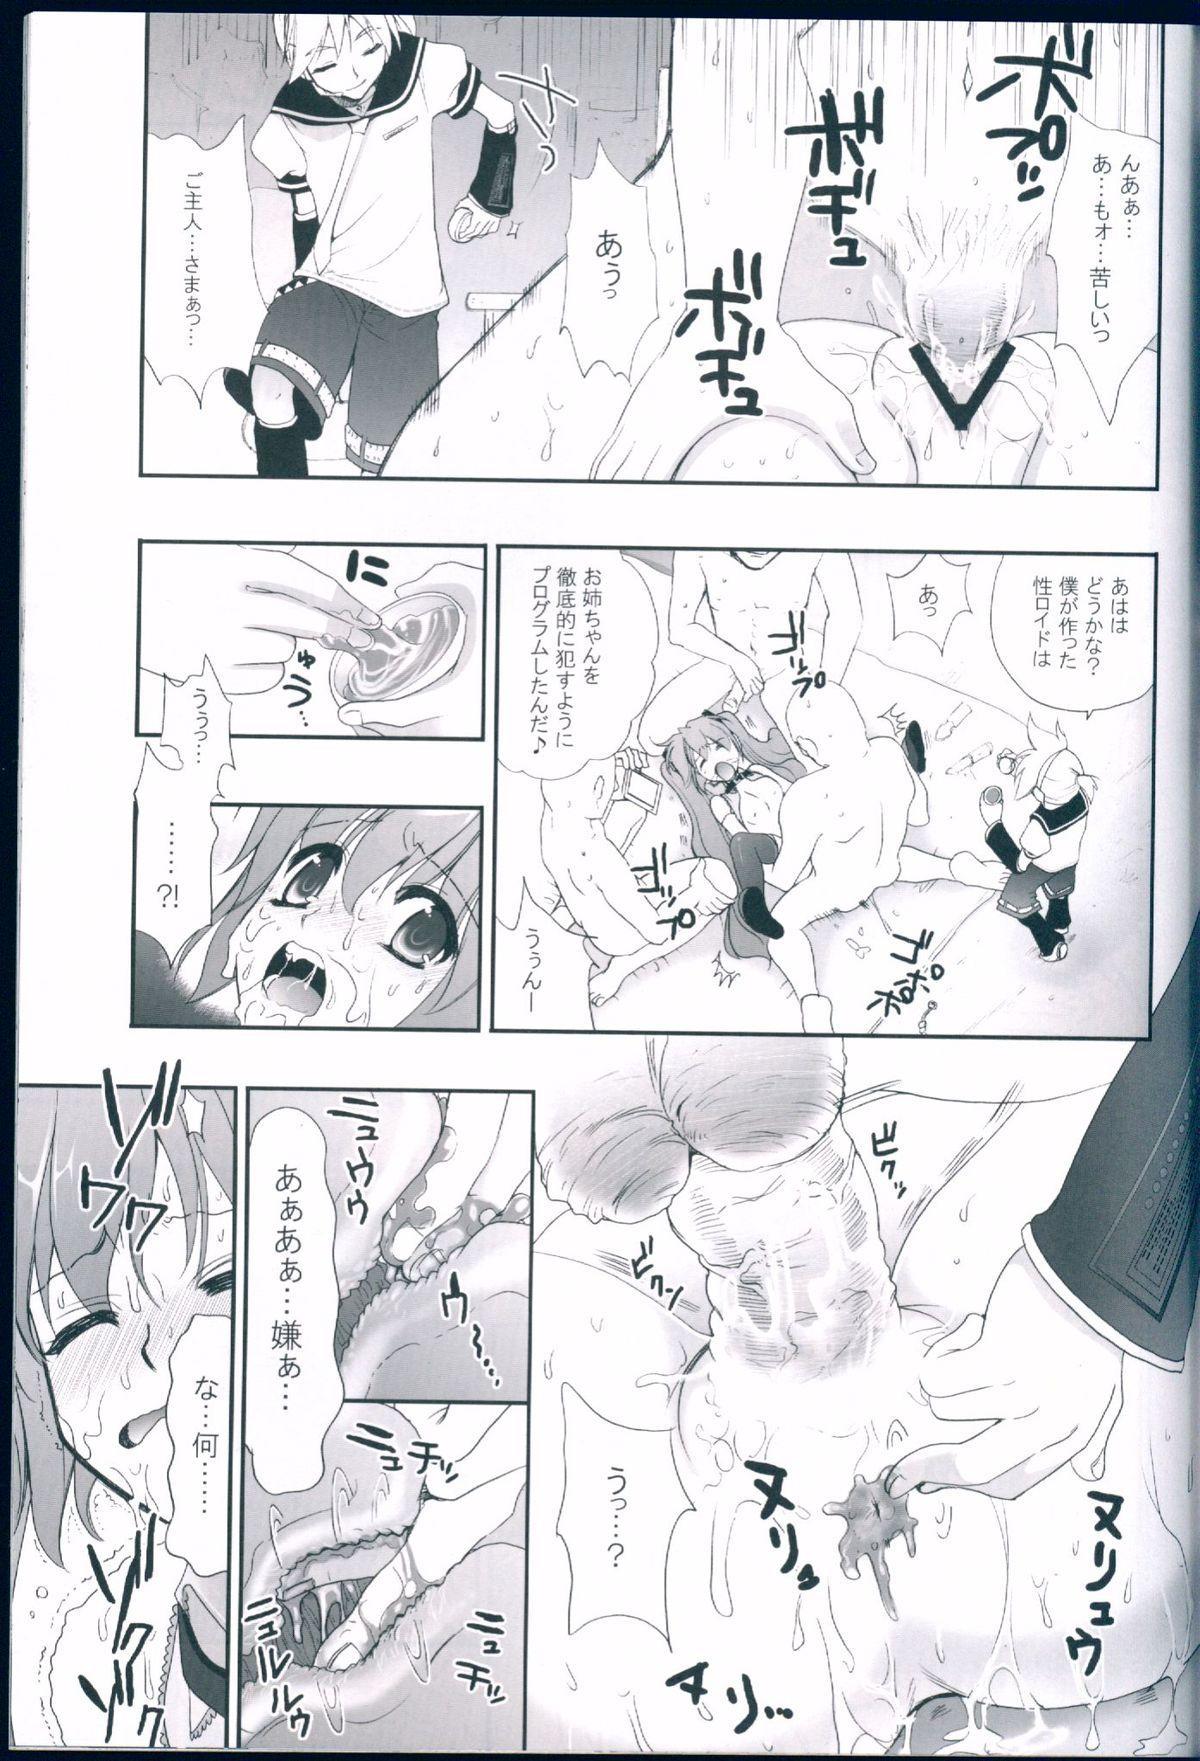 R Juu - Hatsune Miku Kenkan 12